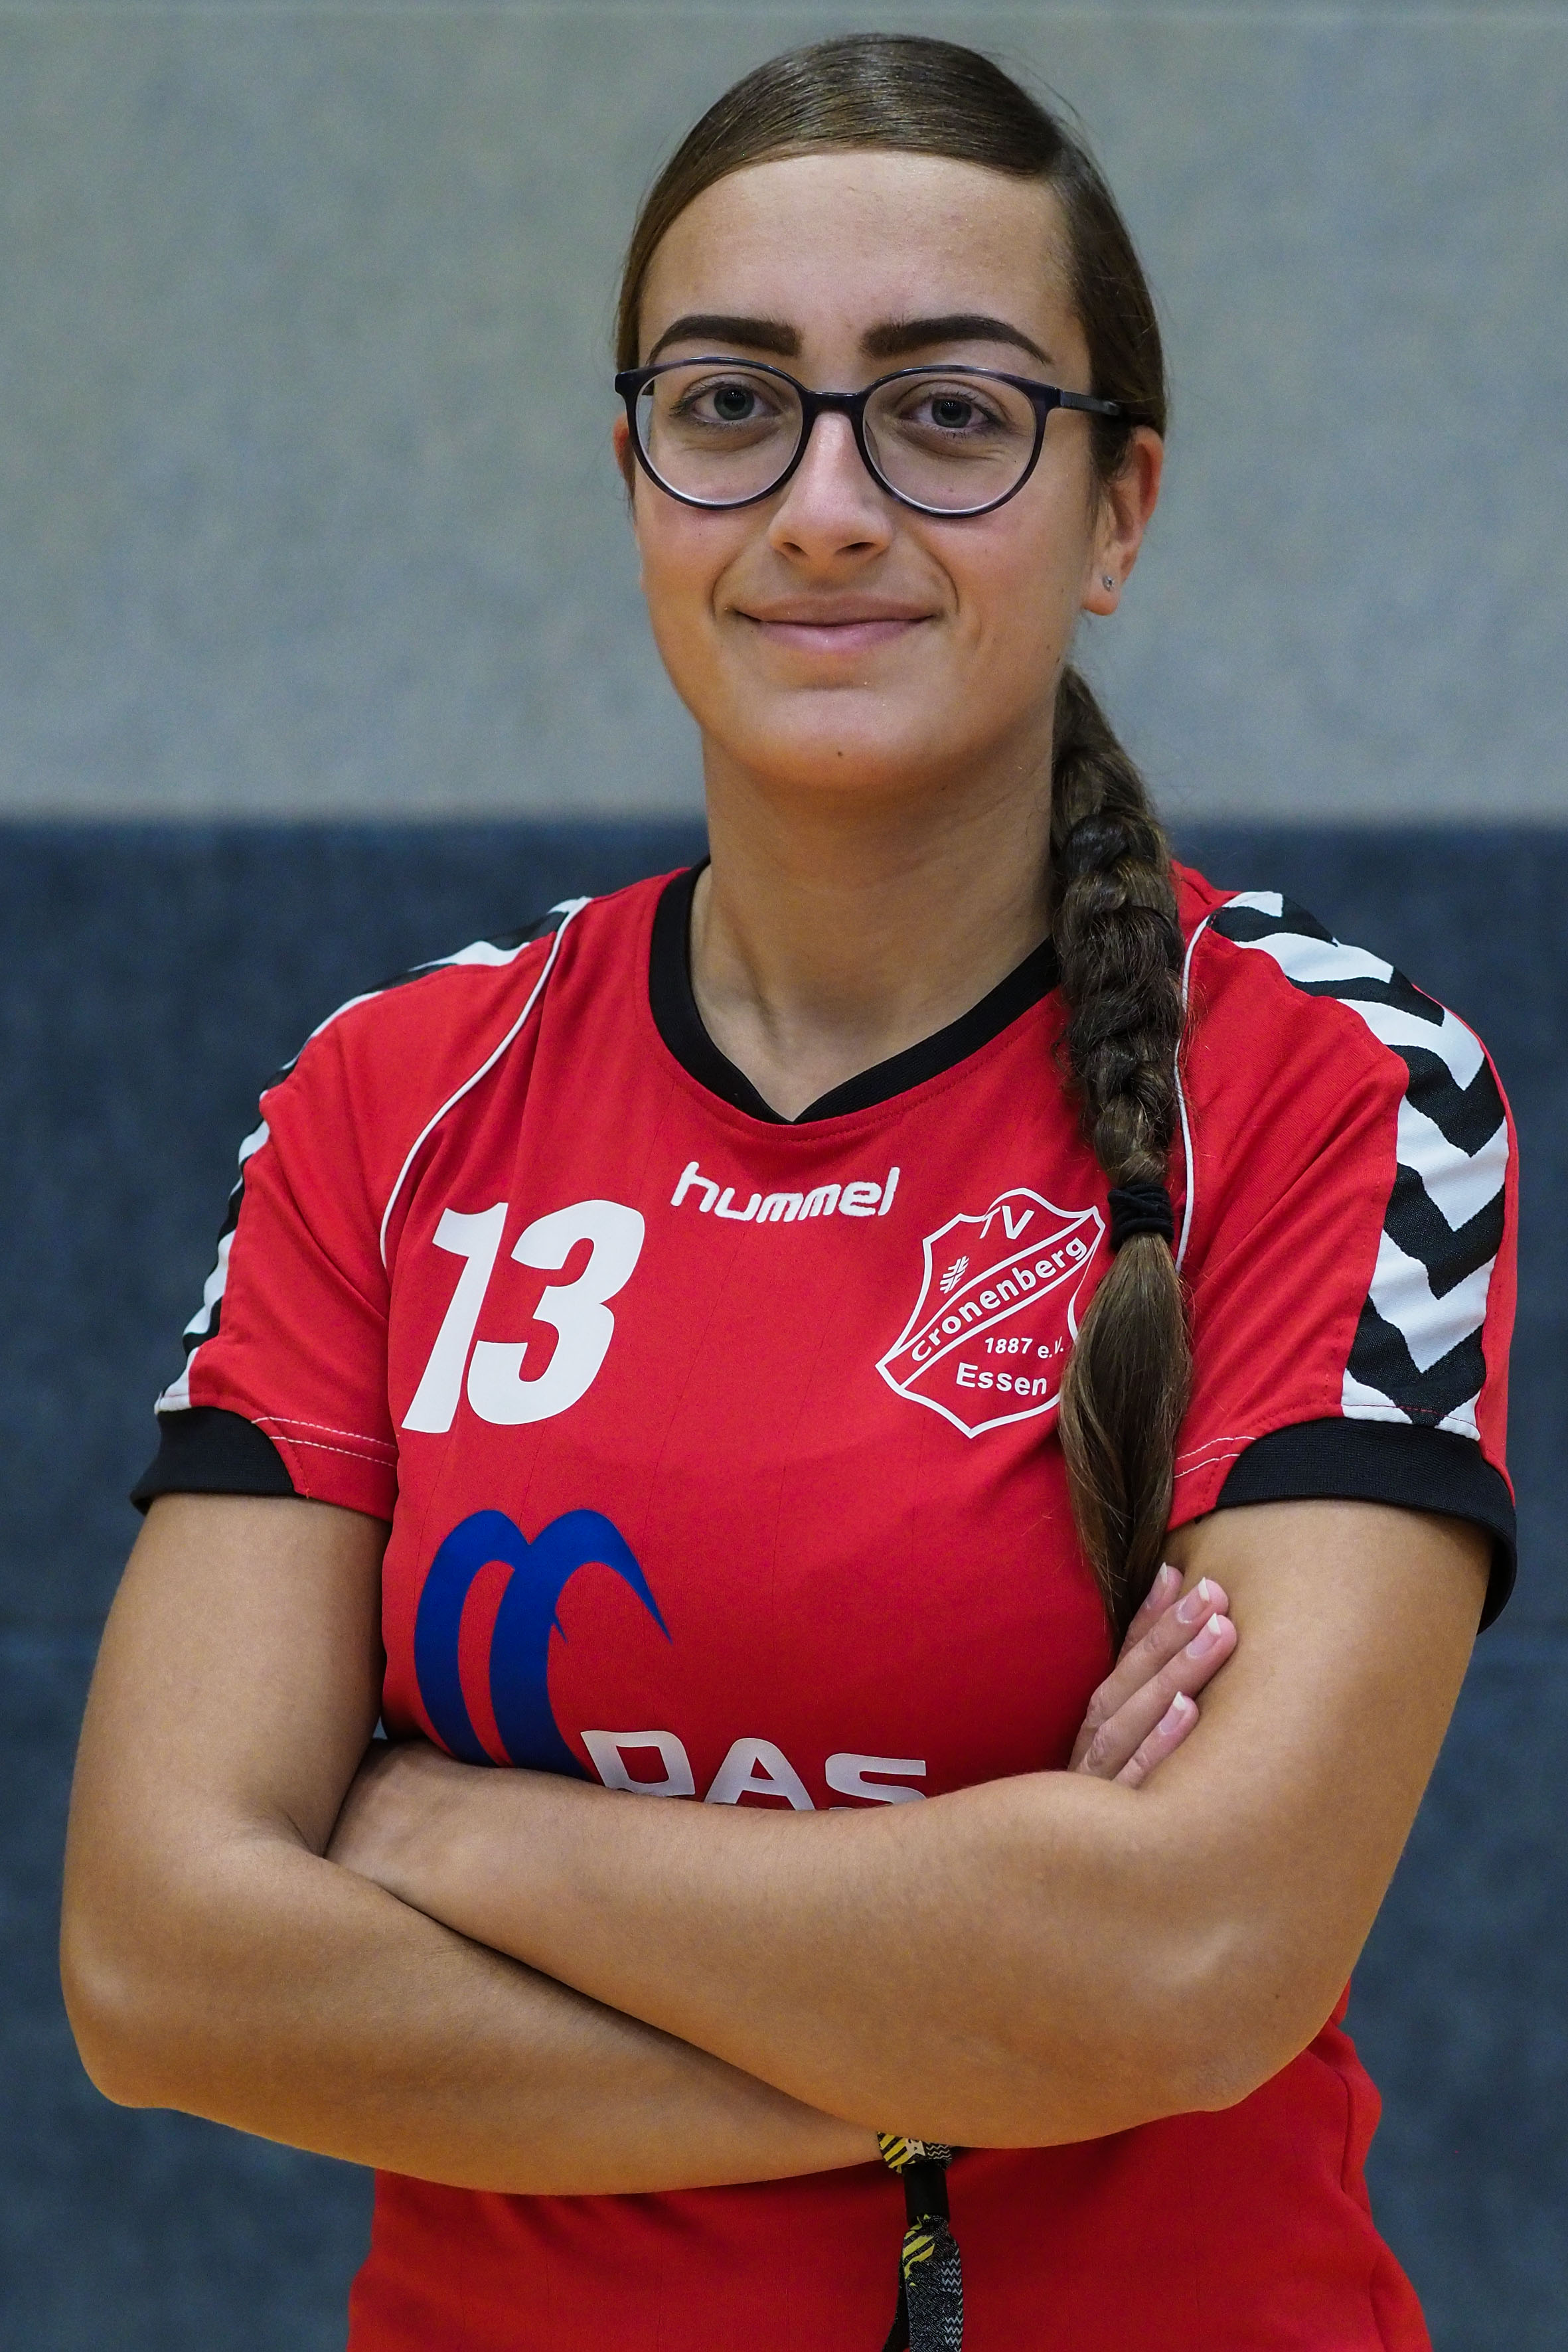 Daniela Mertins